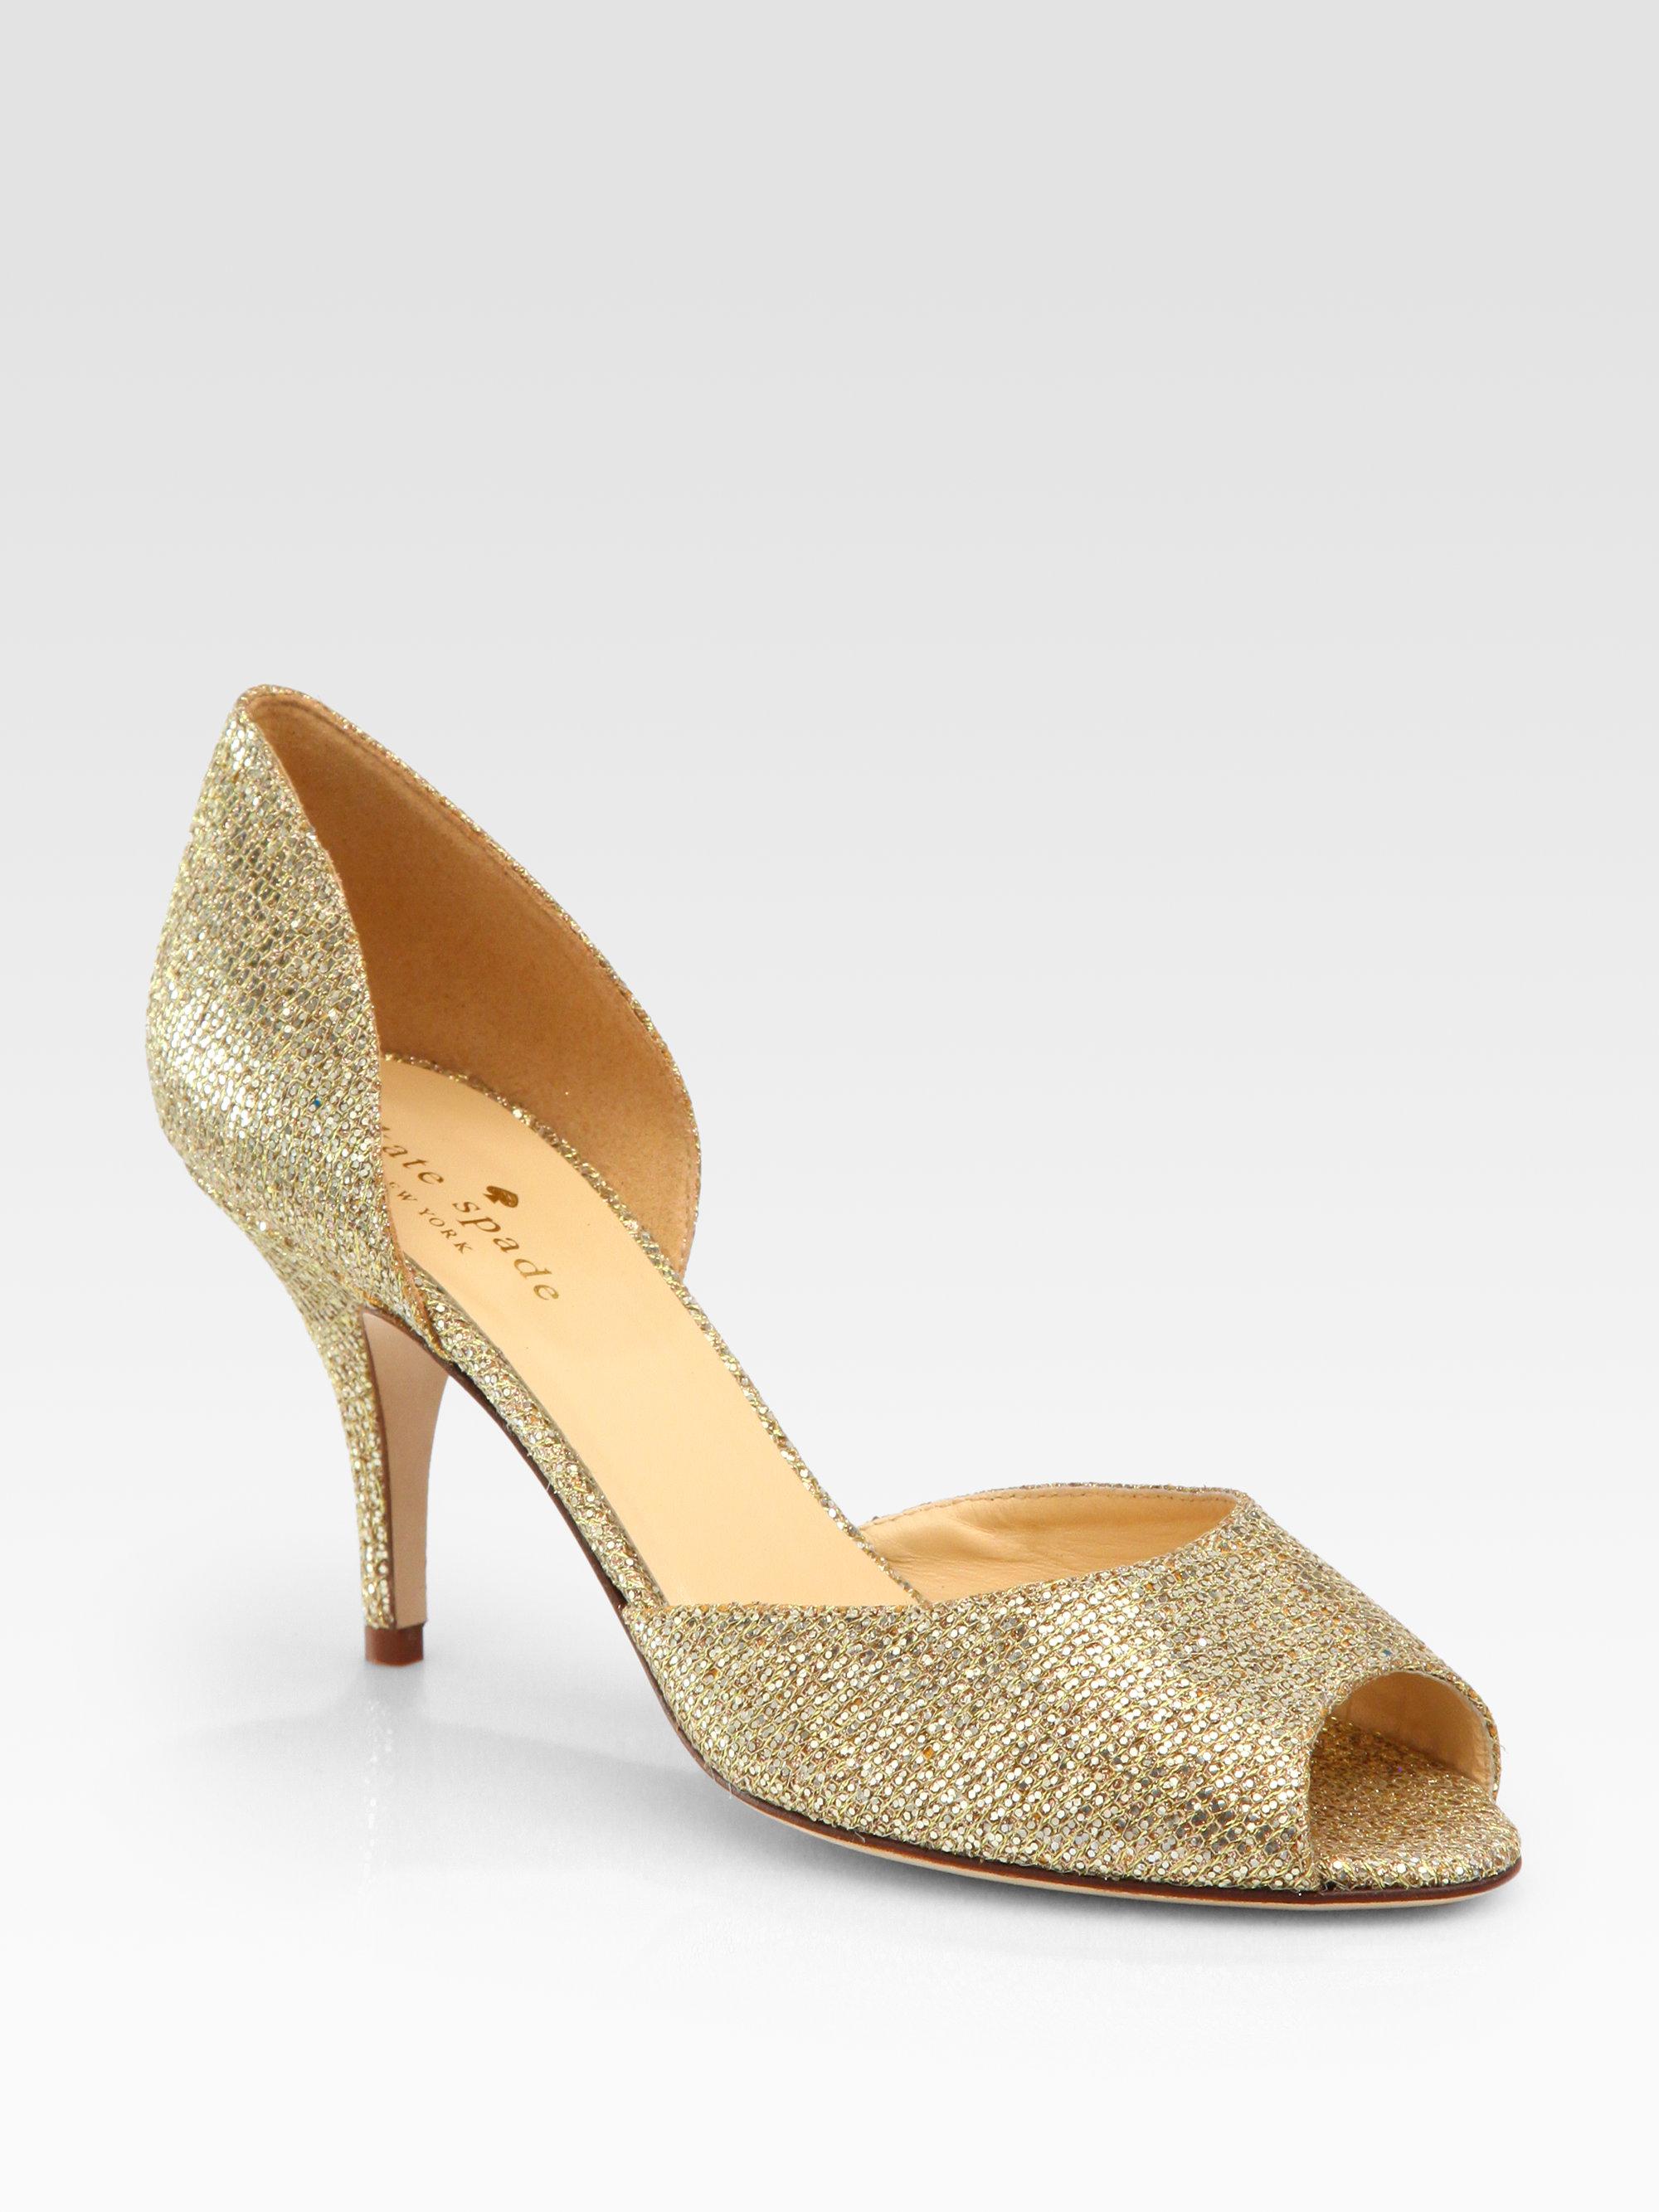 Lyst Kate Spade Sage Glitter D Orsay Pumps In Metallic